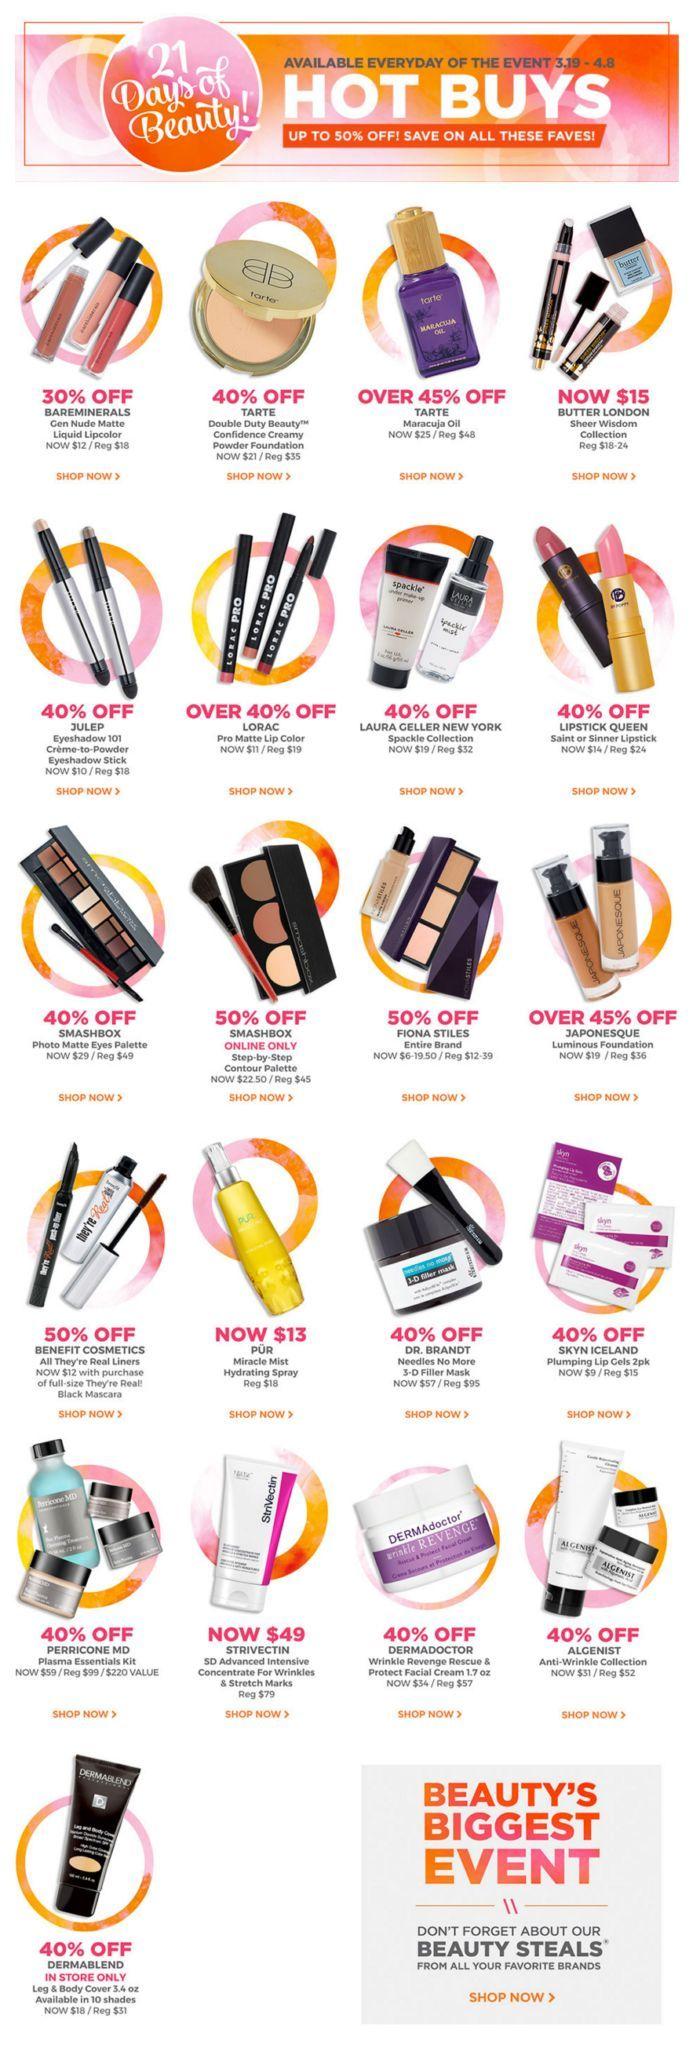 Ulta Beauty Sale | Ulta Beauty 21 Days of Beauty | Discount Makeup